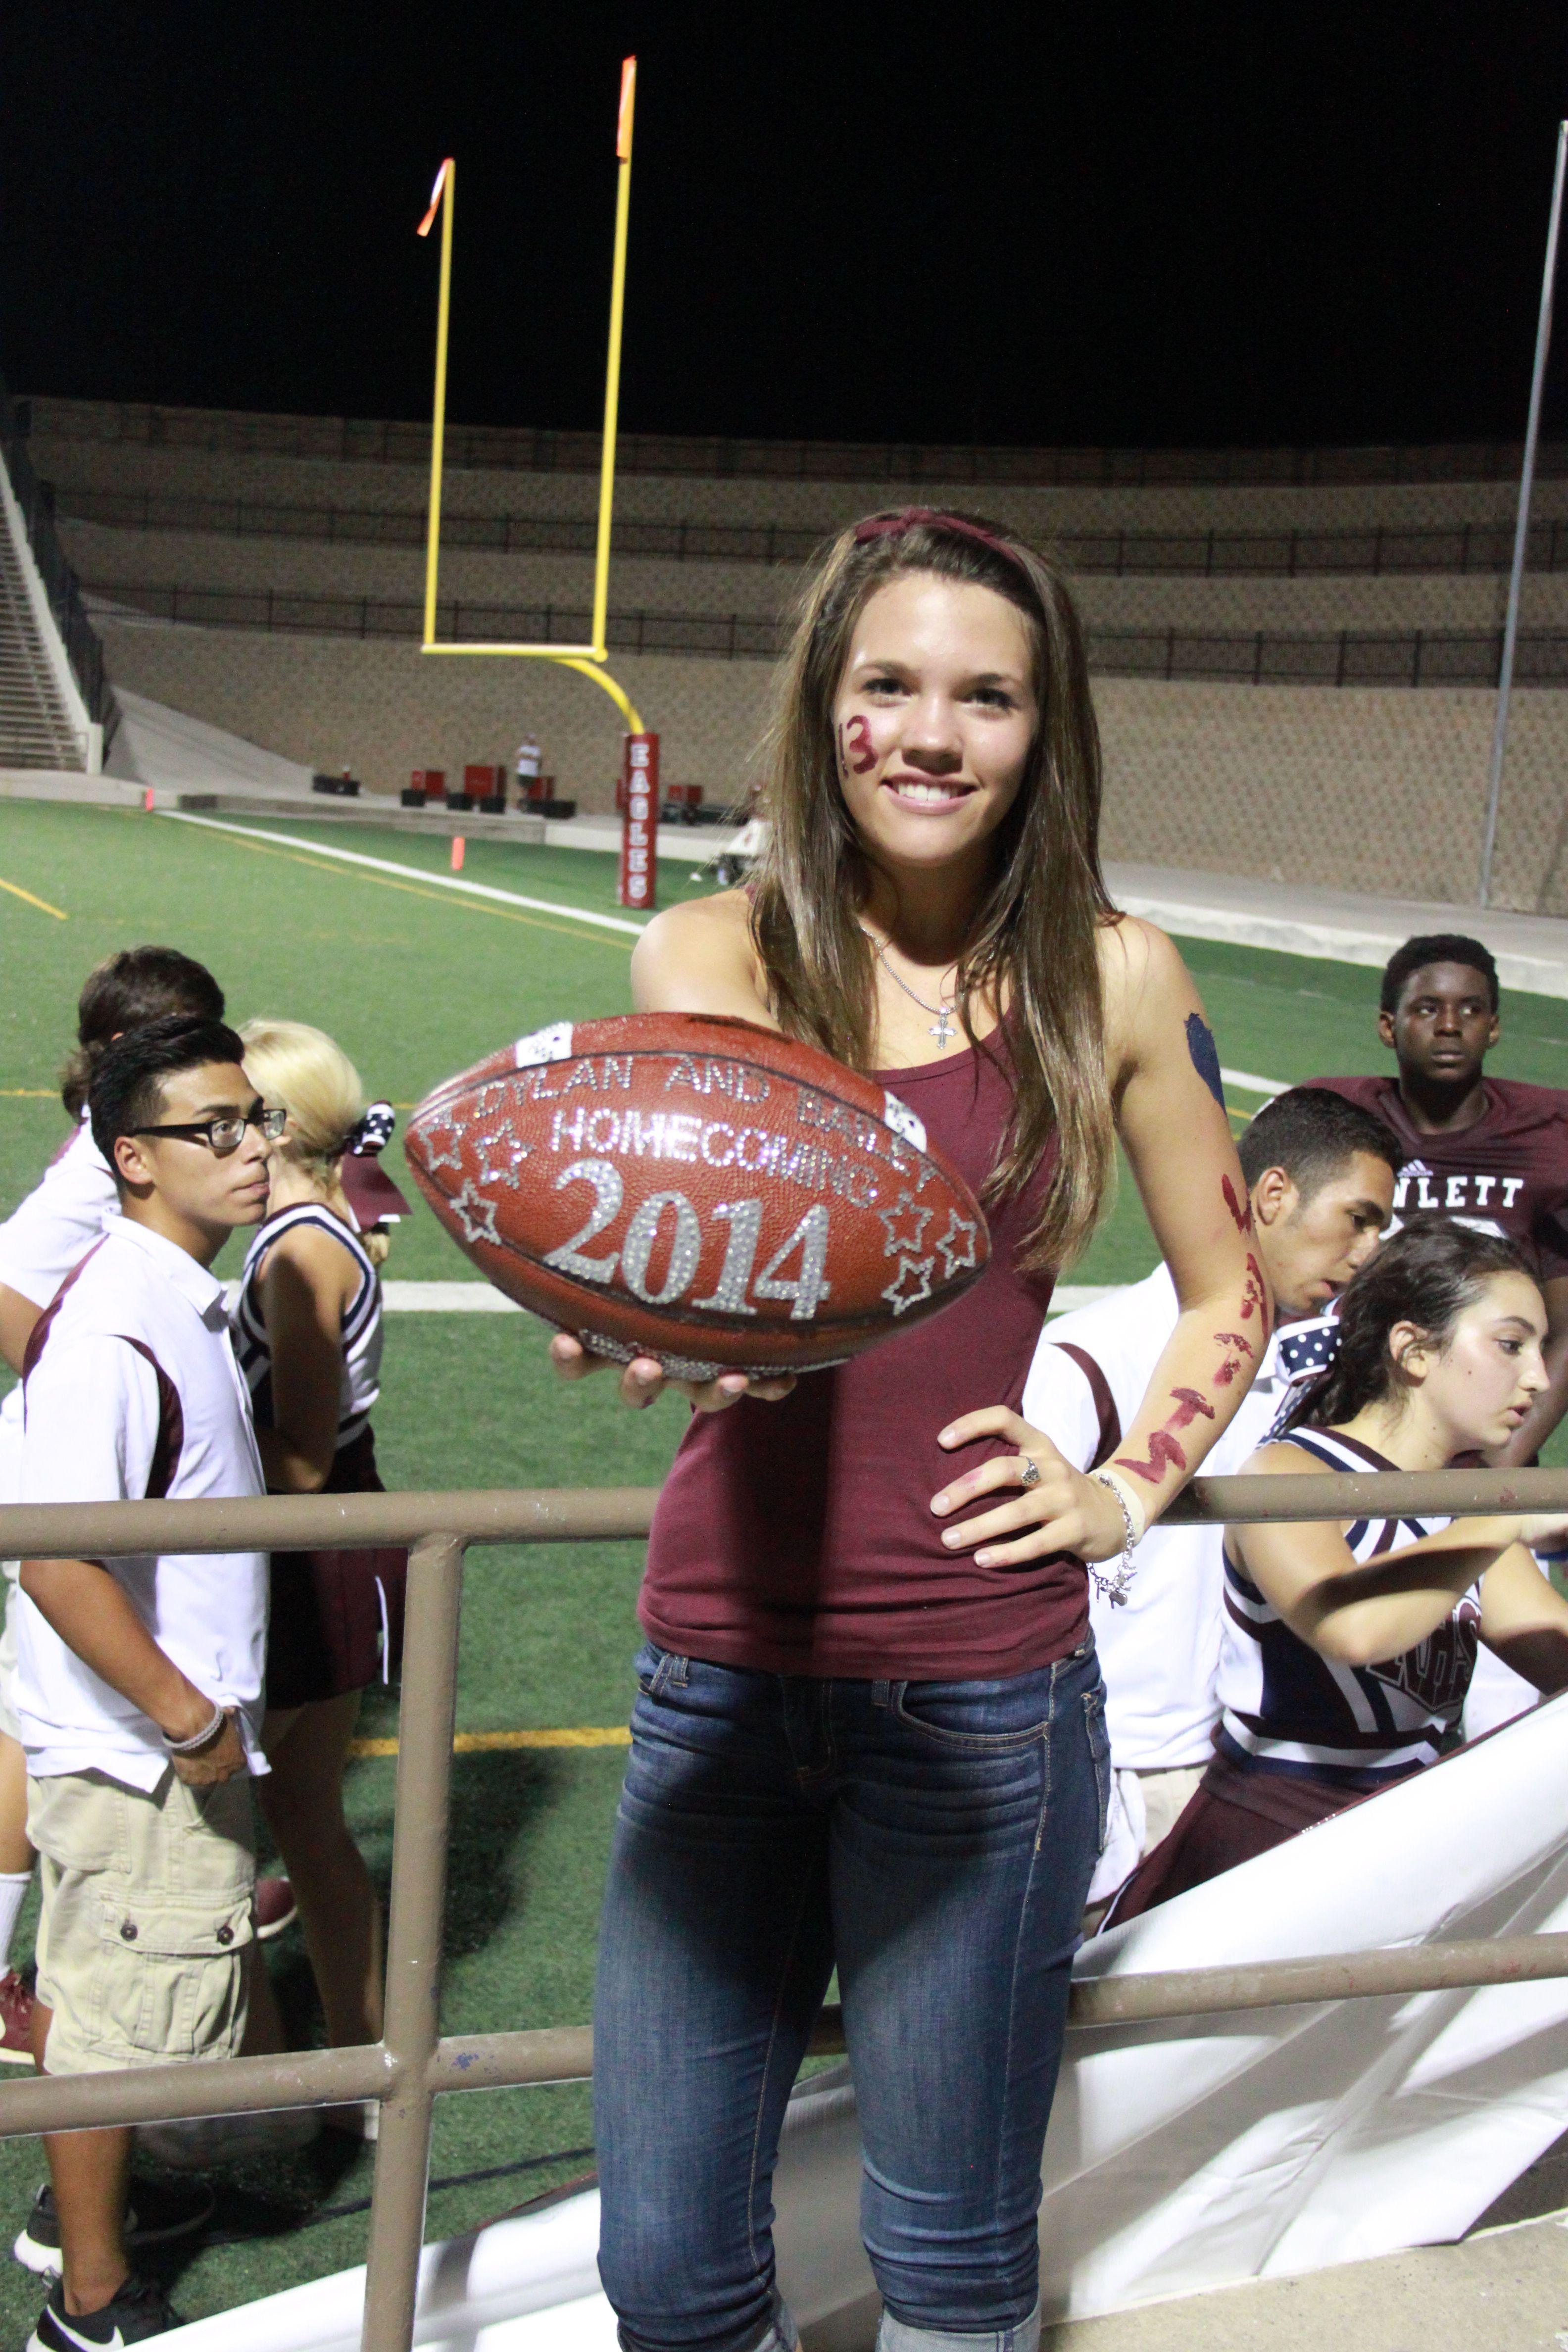 cute homecoming proposal at a texas high school football game